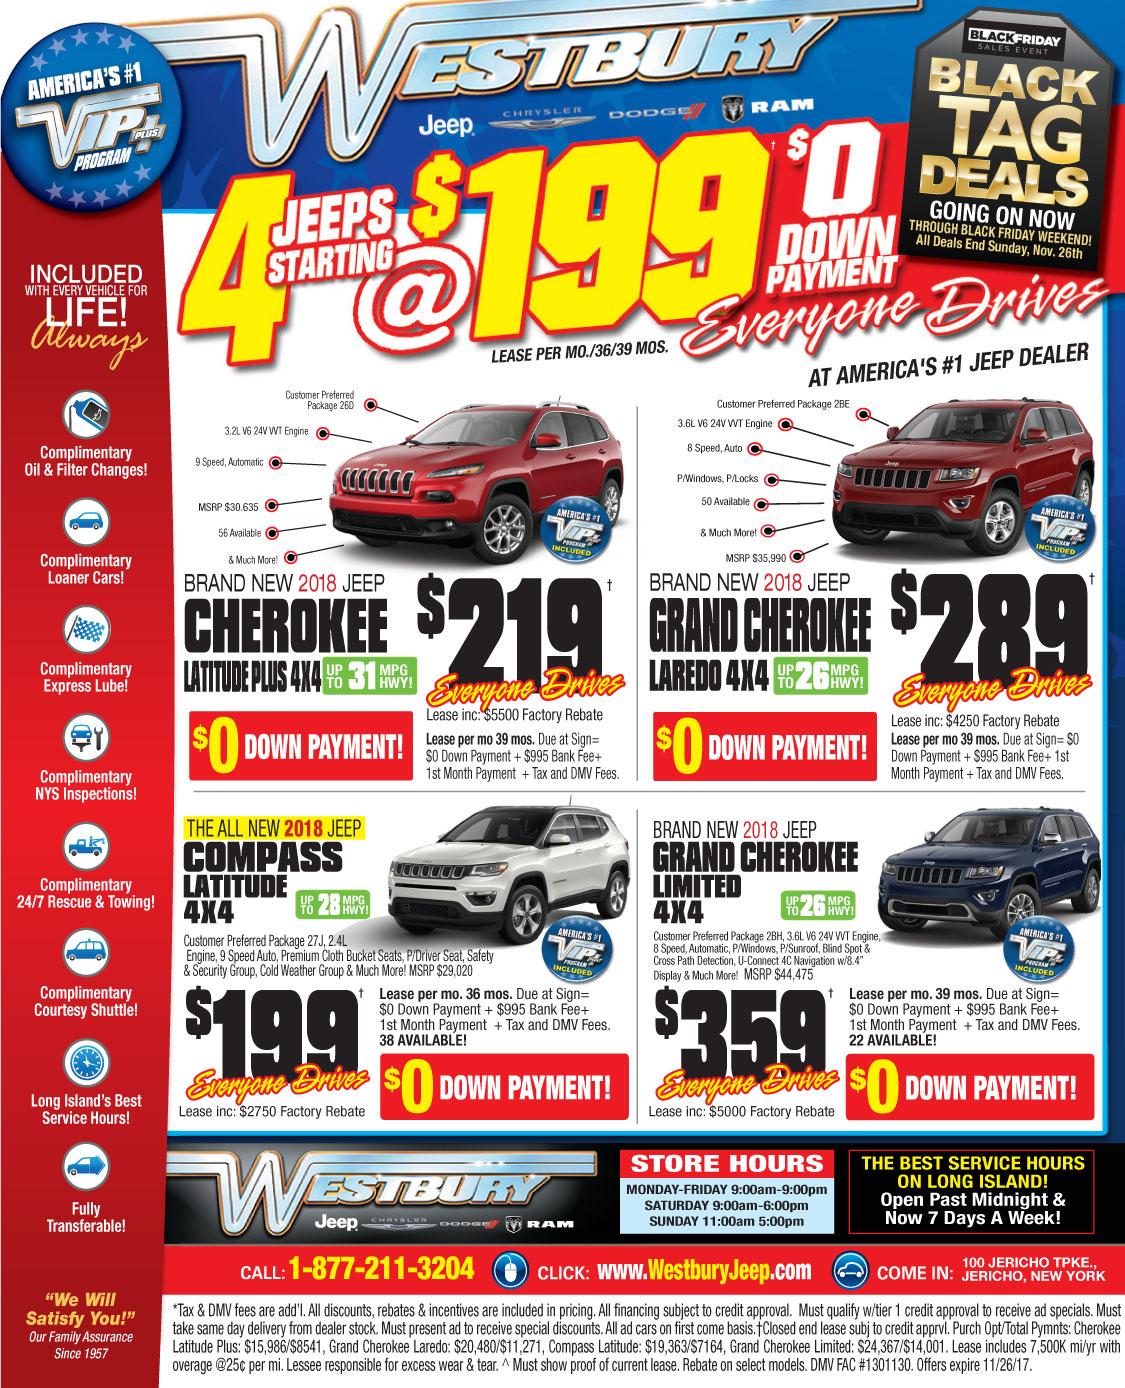 Westbury-Jeep-Black-Friday-Deals